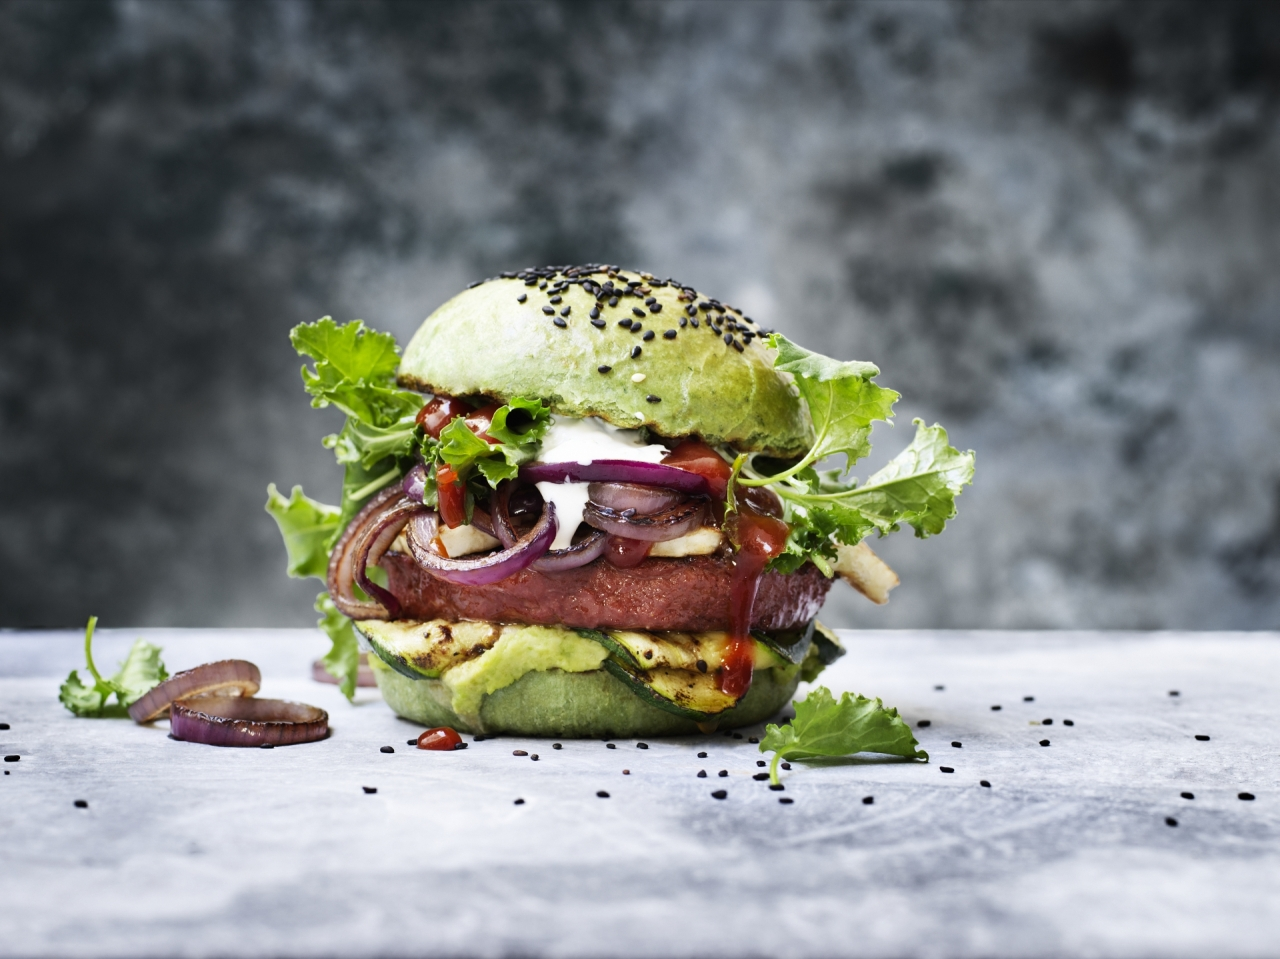 Grilled Green Burger